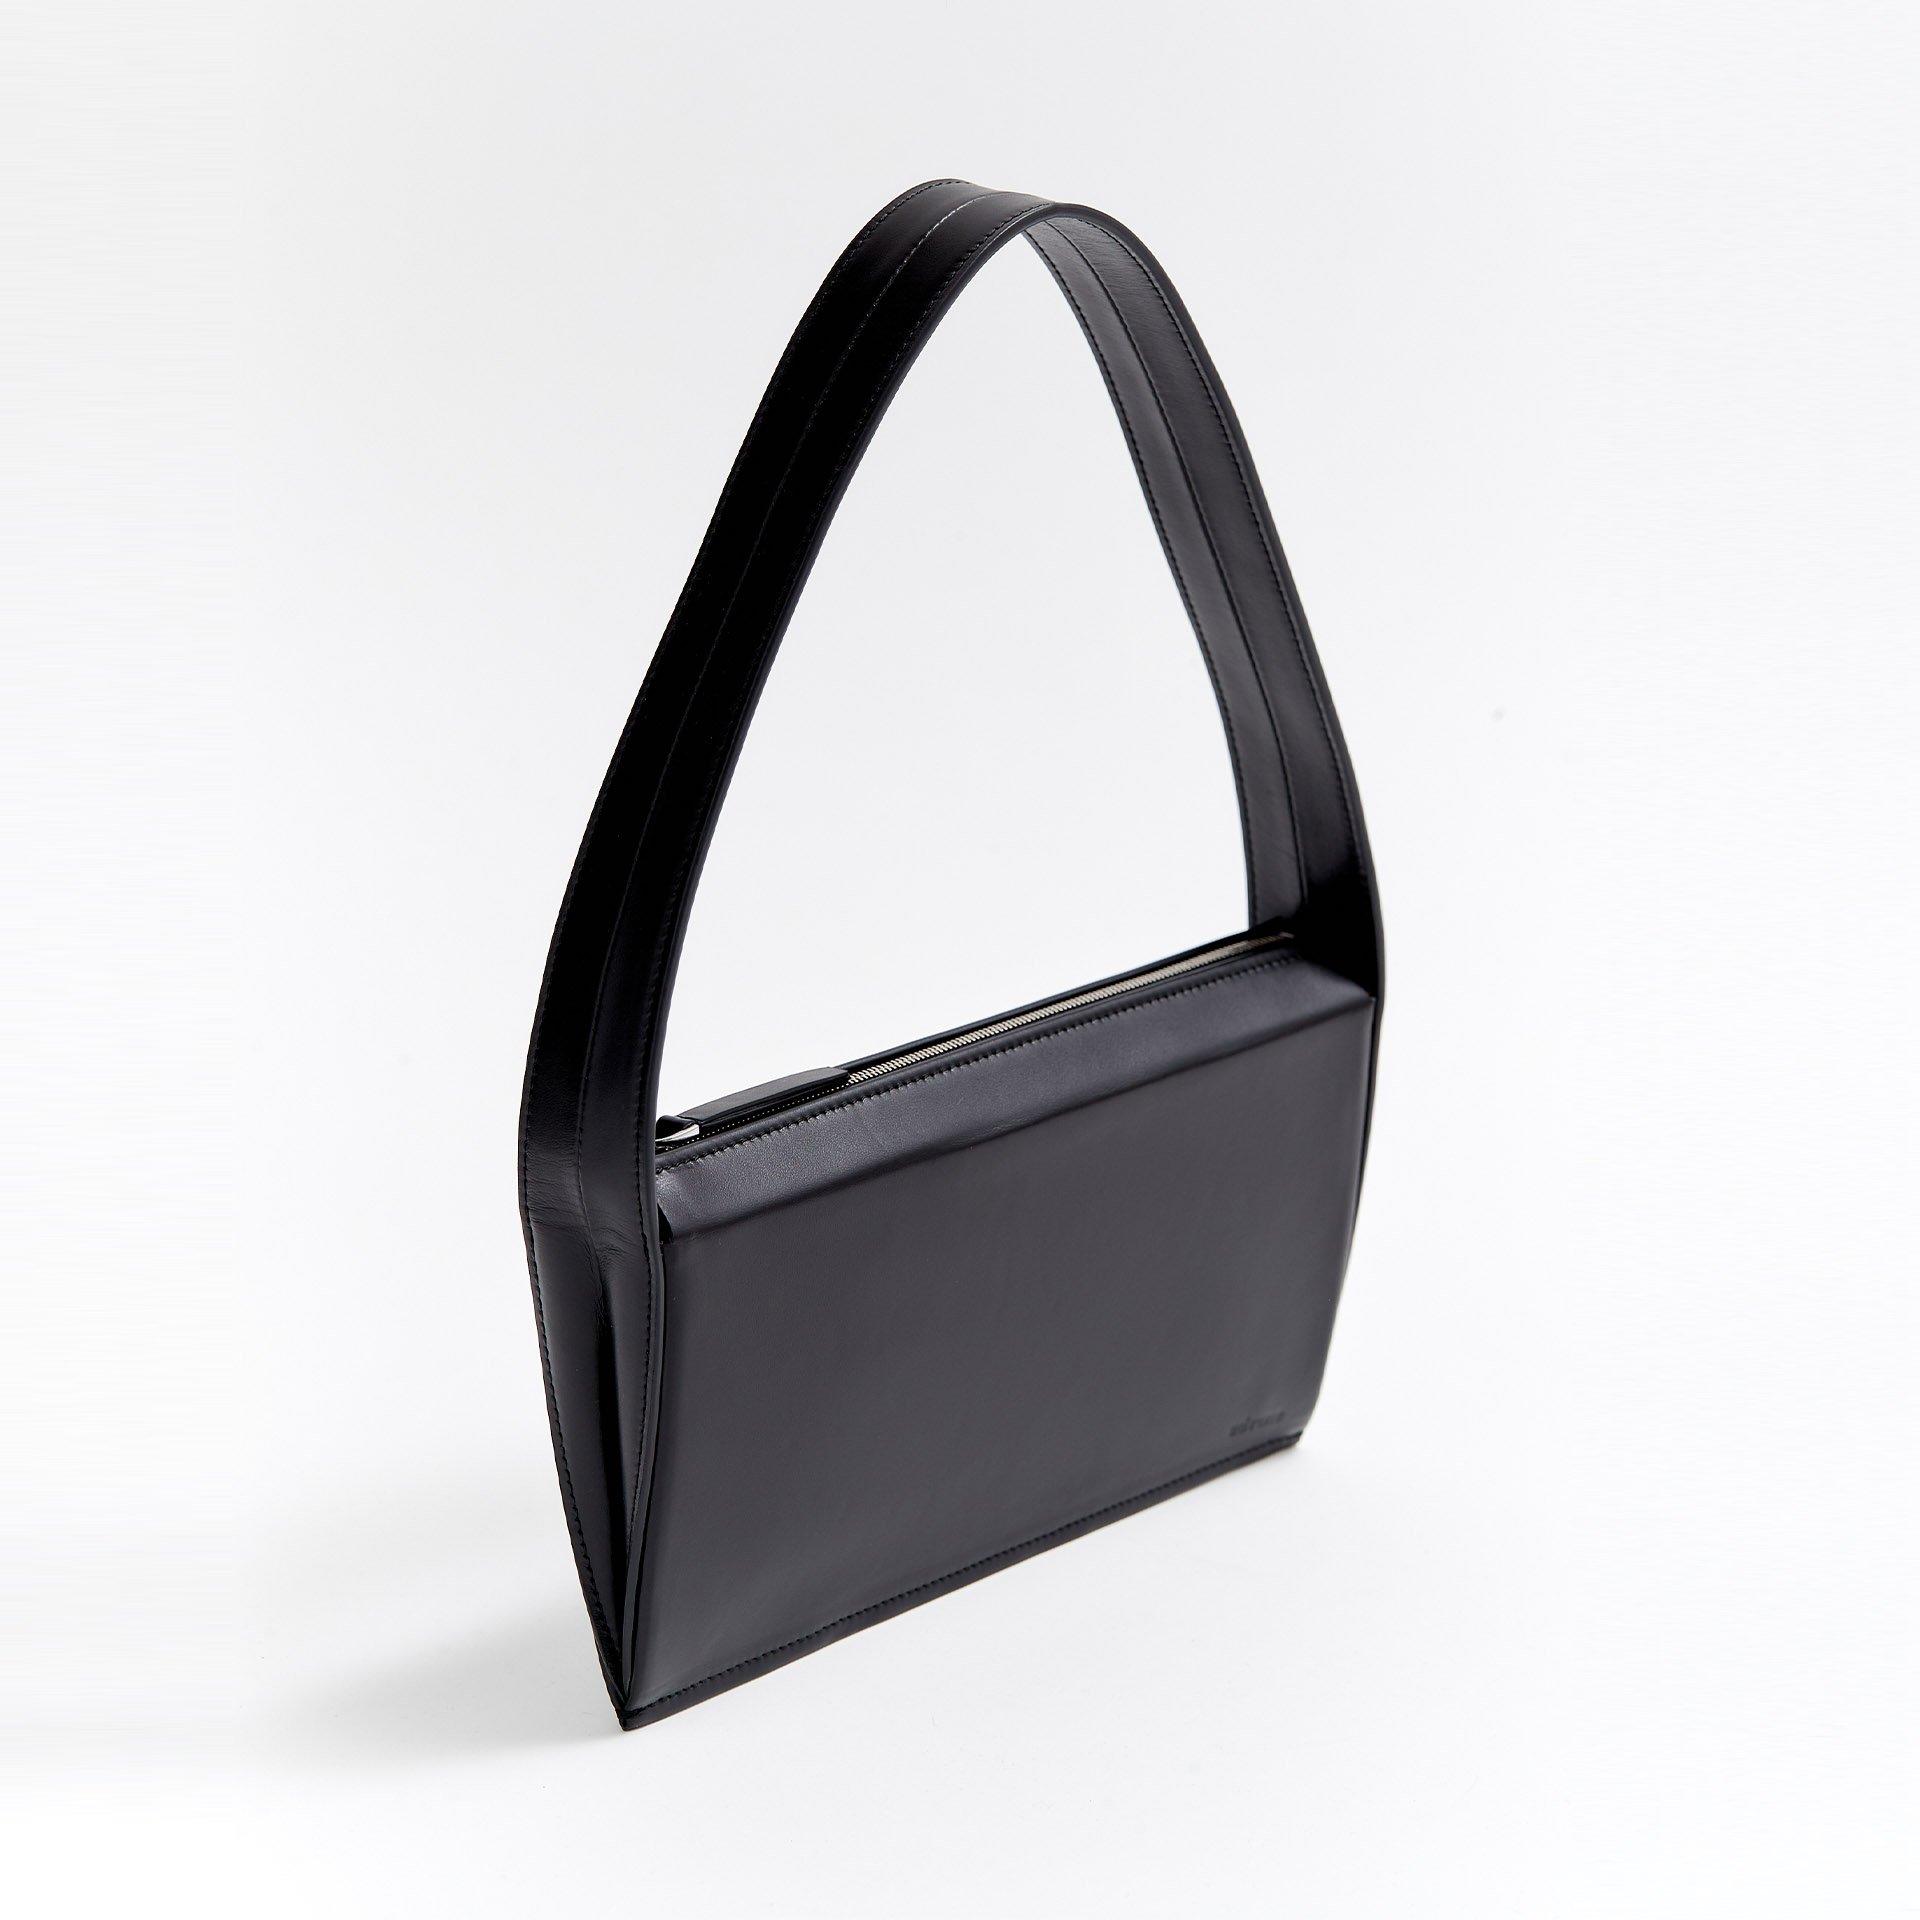 THE EDGE BAG | BLACK by Advene, available on advenedesign.com for $395 Irina Shayk Bags Exact Product